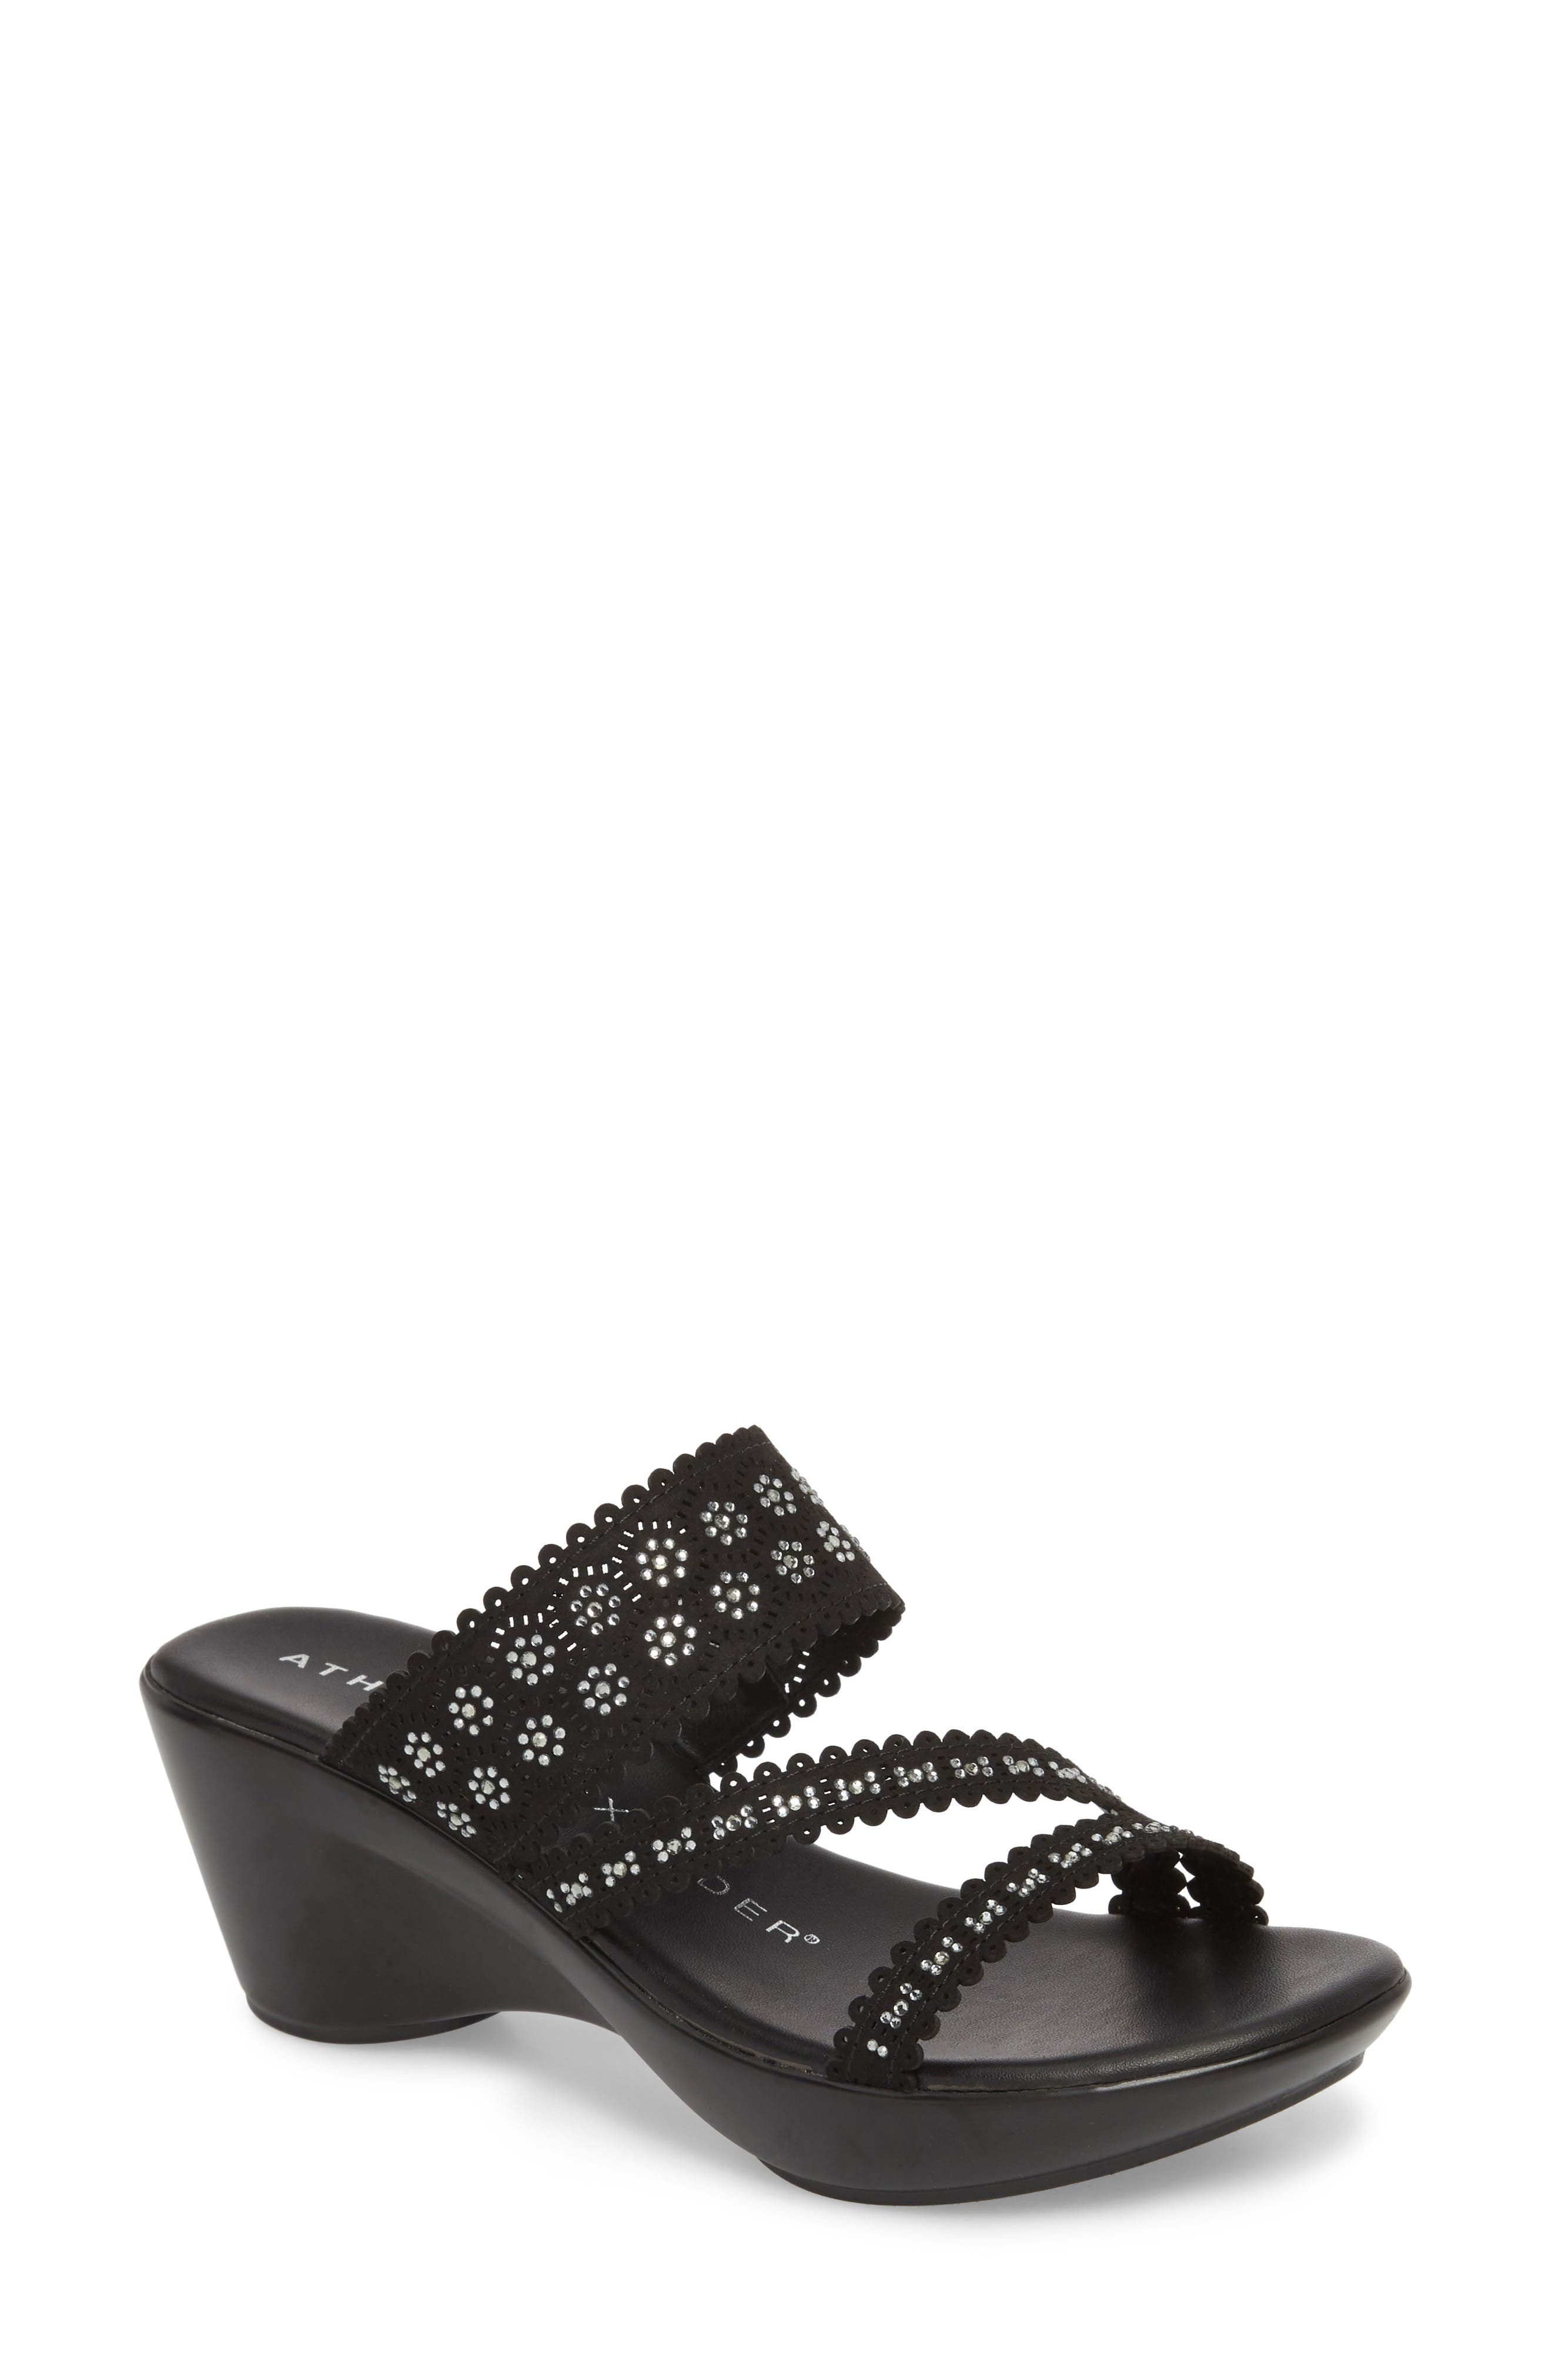 Poppy Wedge Sandal,                         Main,                         color, Black Fabric